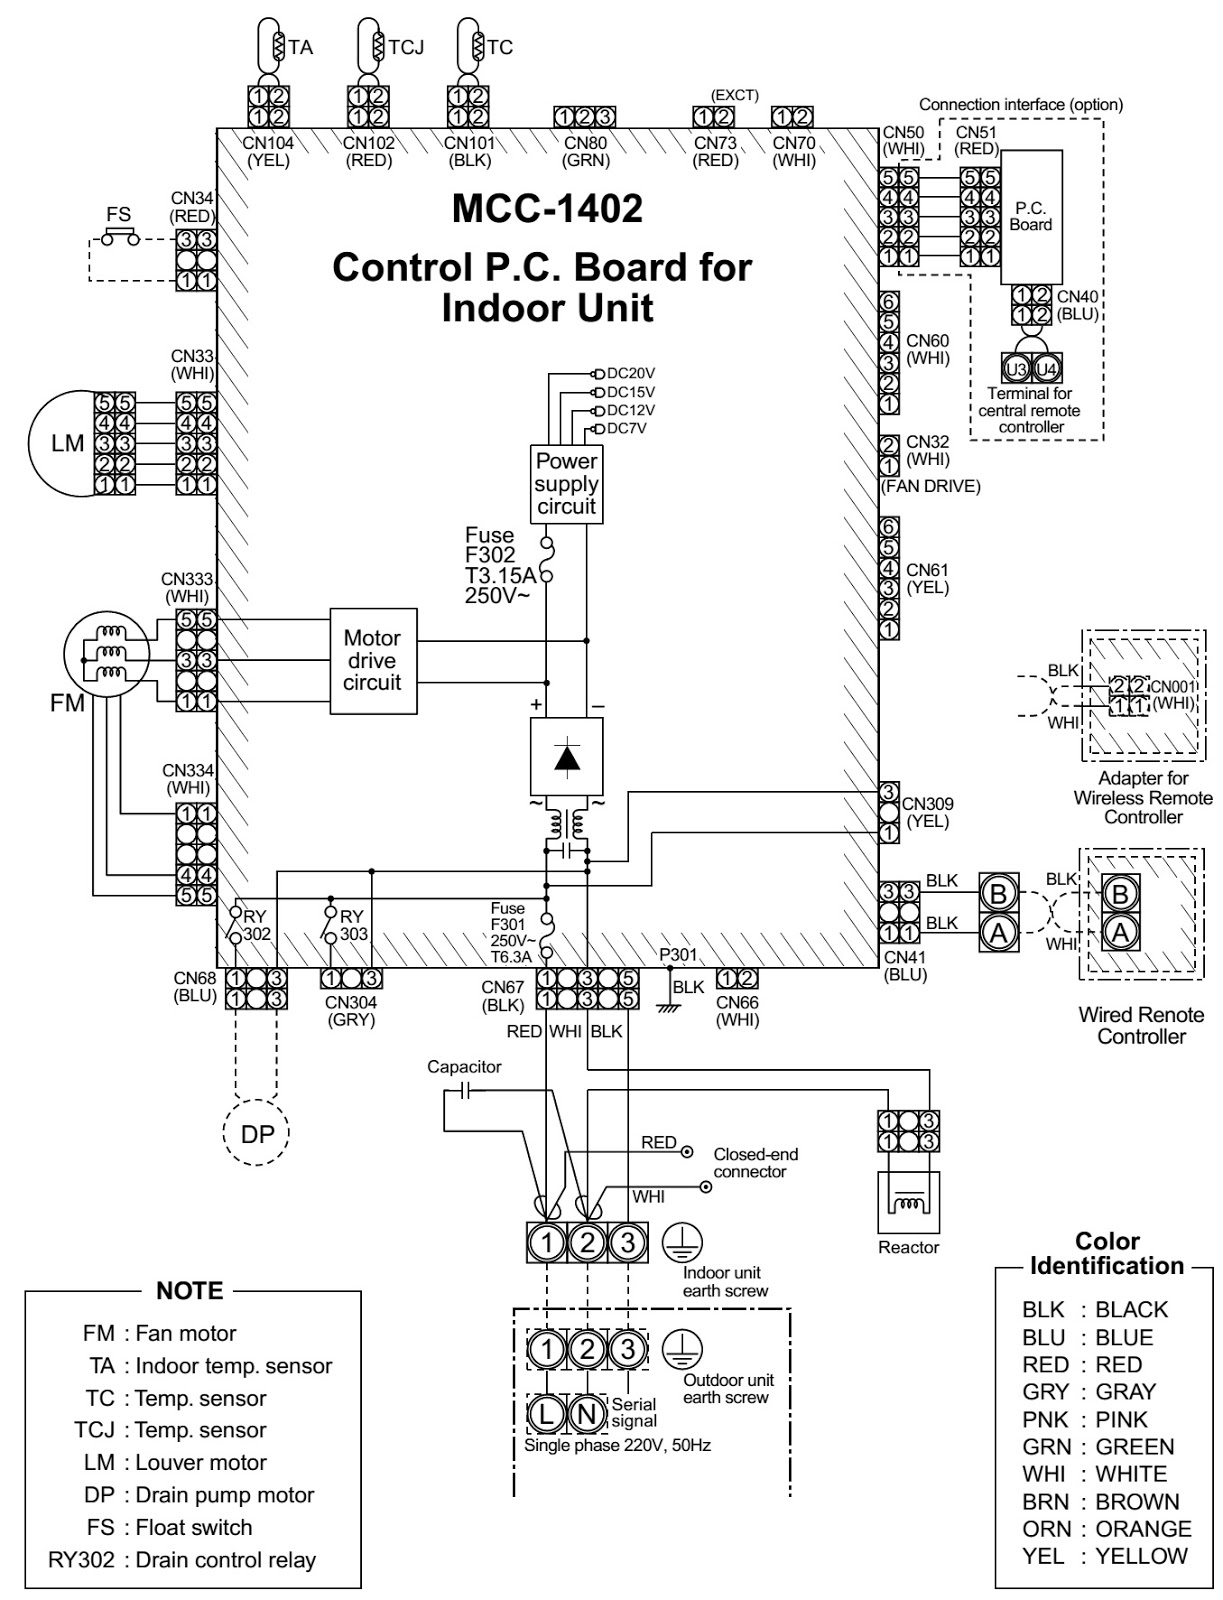 medium resolution of toshiba air conditioner wiring diagram toshiba airconditioners split type wiring diagram digital inverter